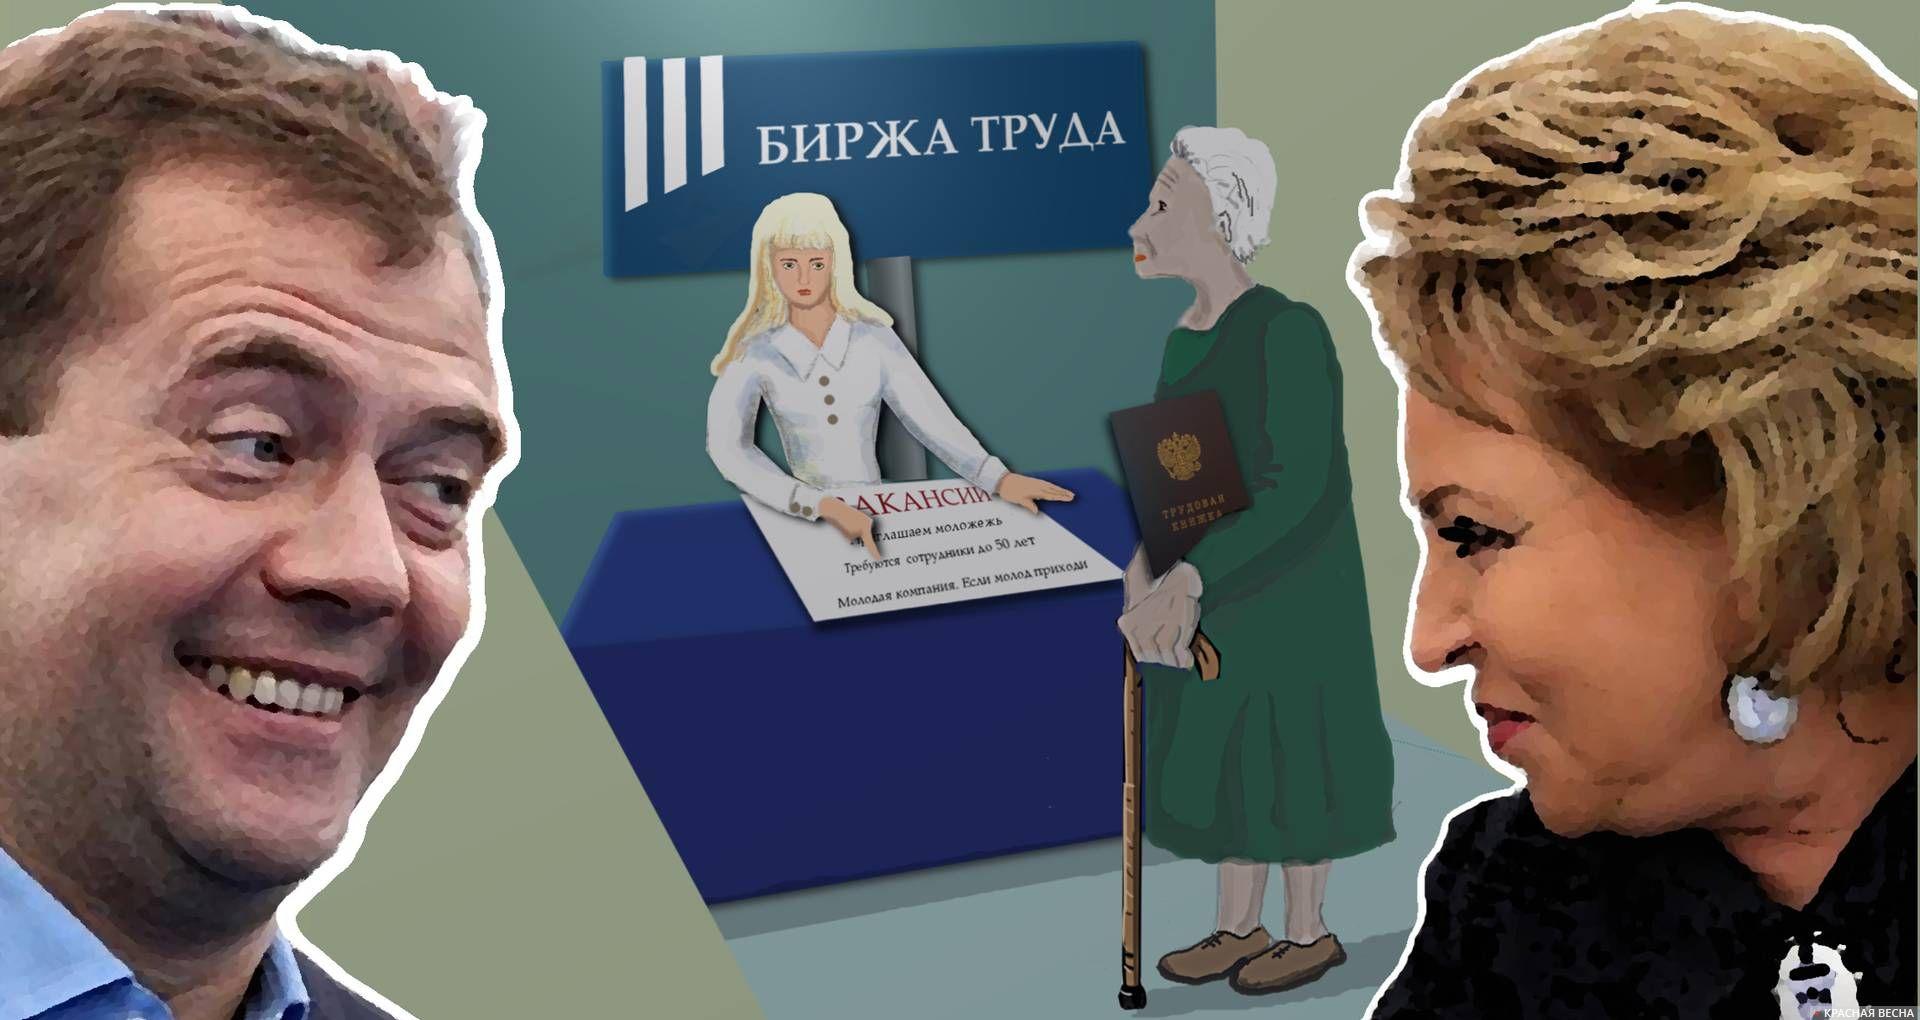 Пенсионная реформа. Биржа труда